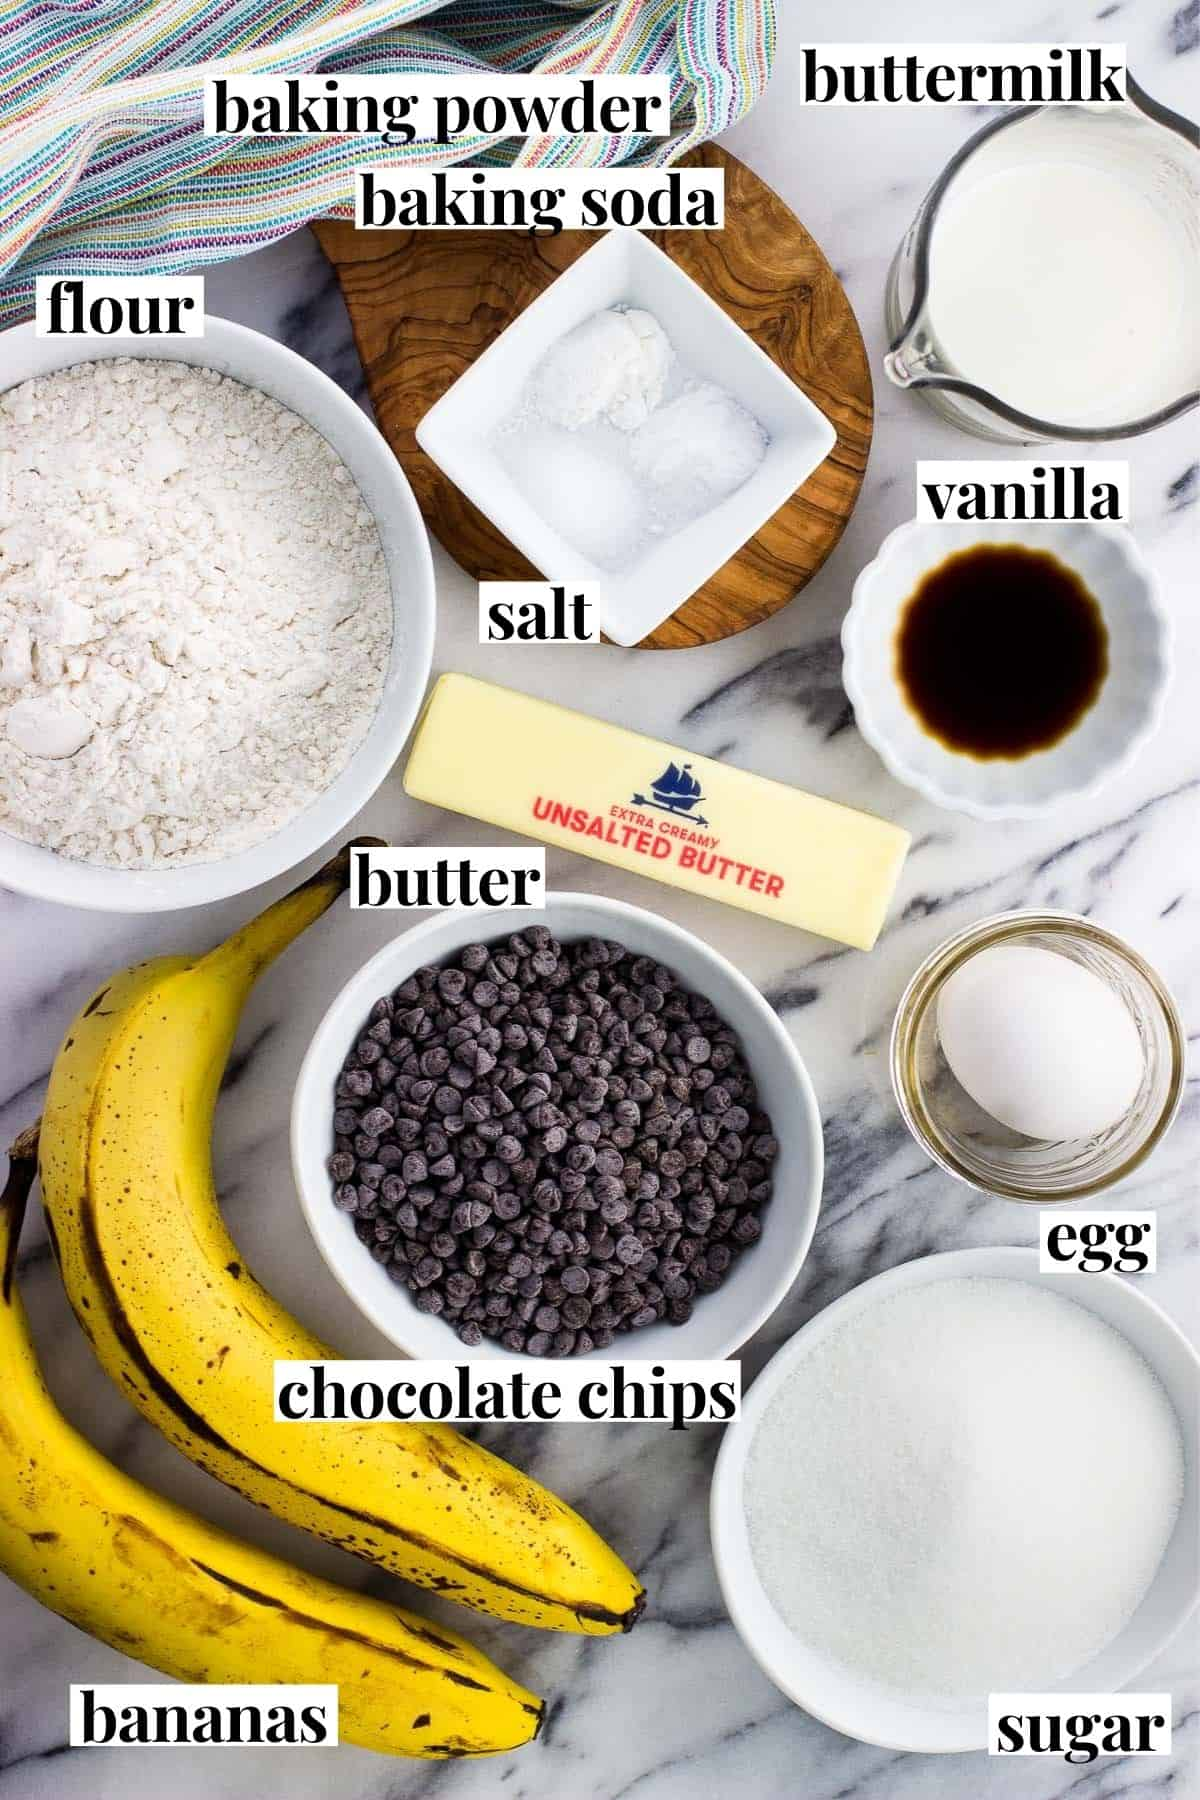 Labeled crumb cake ingredients in separate bowls.